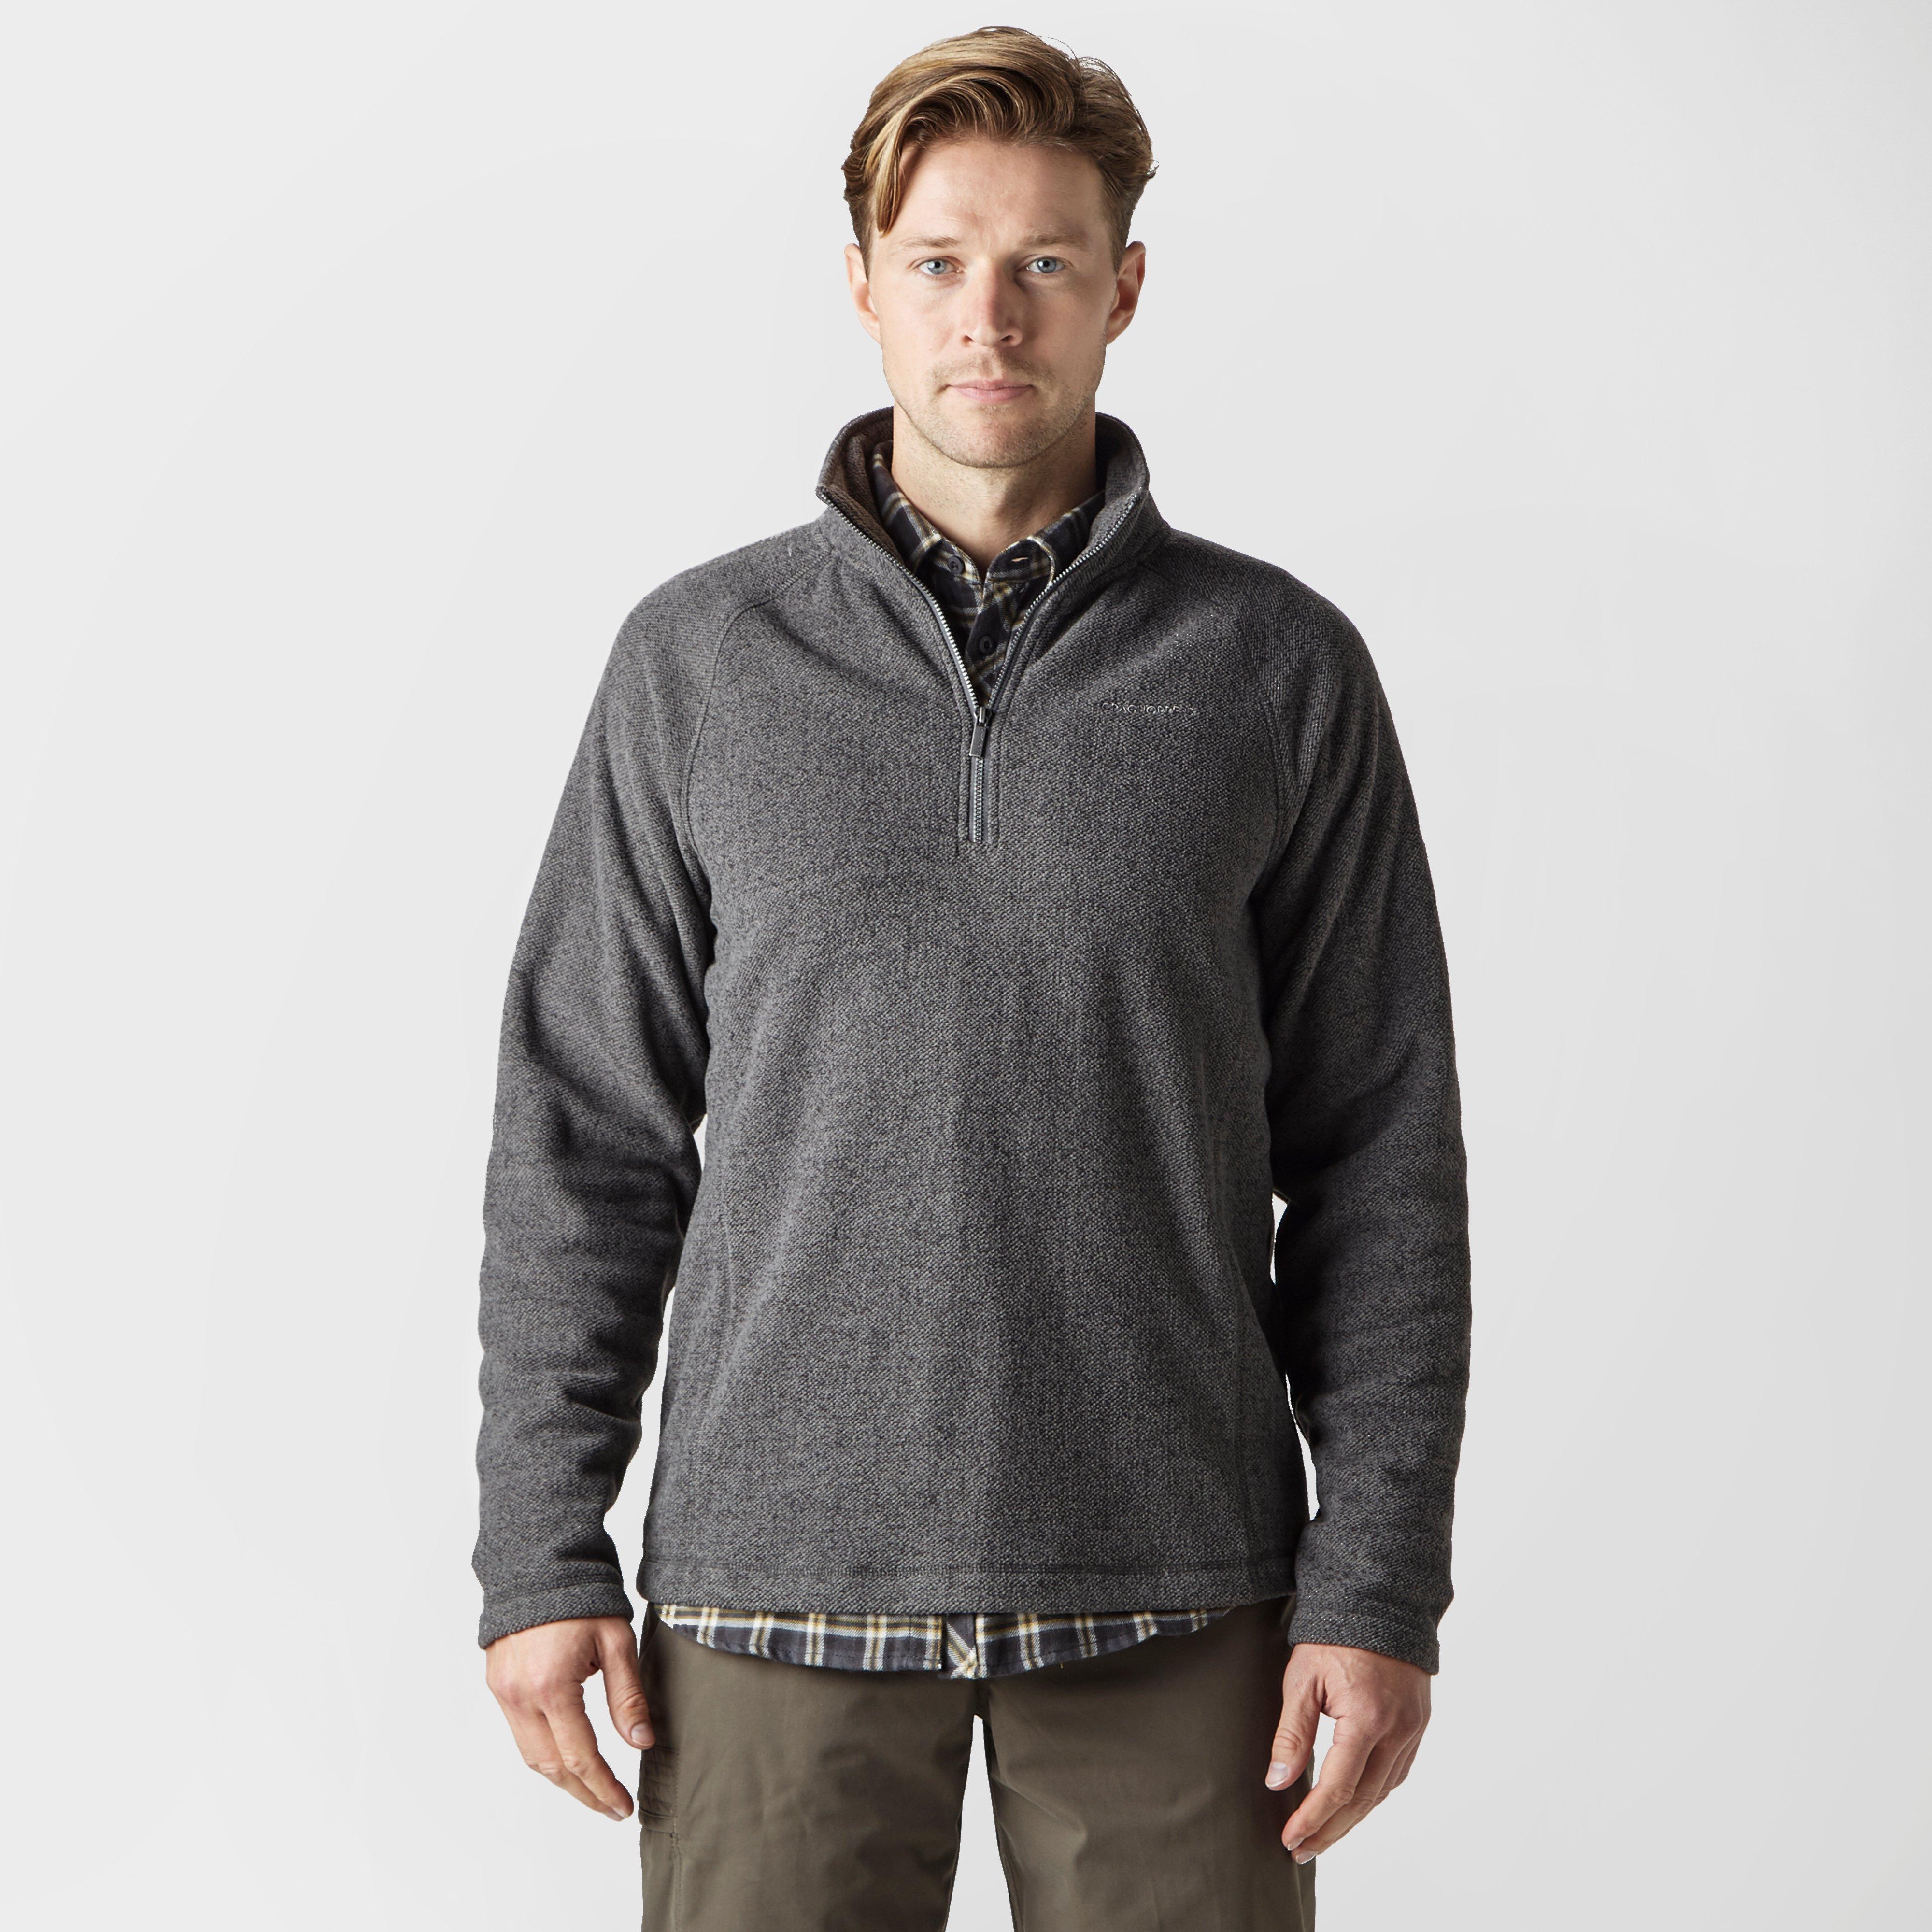 Craghoppers Craghoppers Mens Tindall Half-Zip Fleece - Grey, Grey